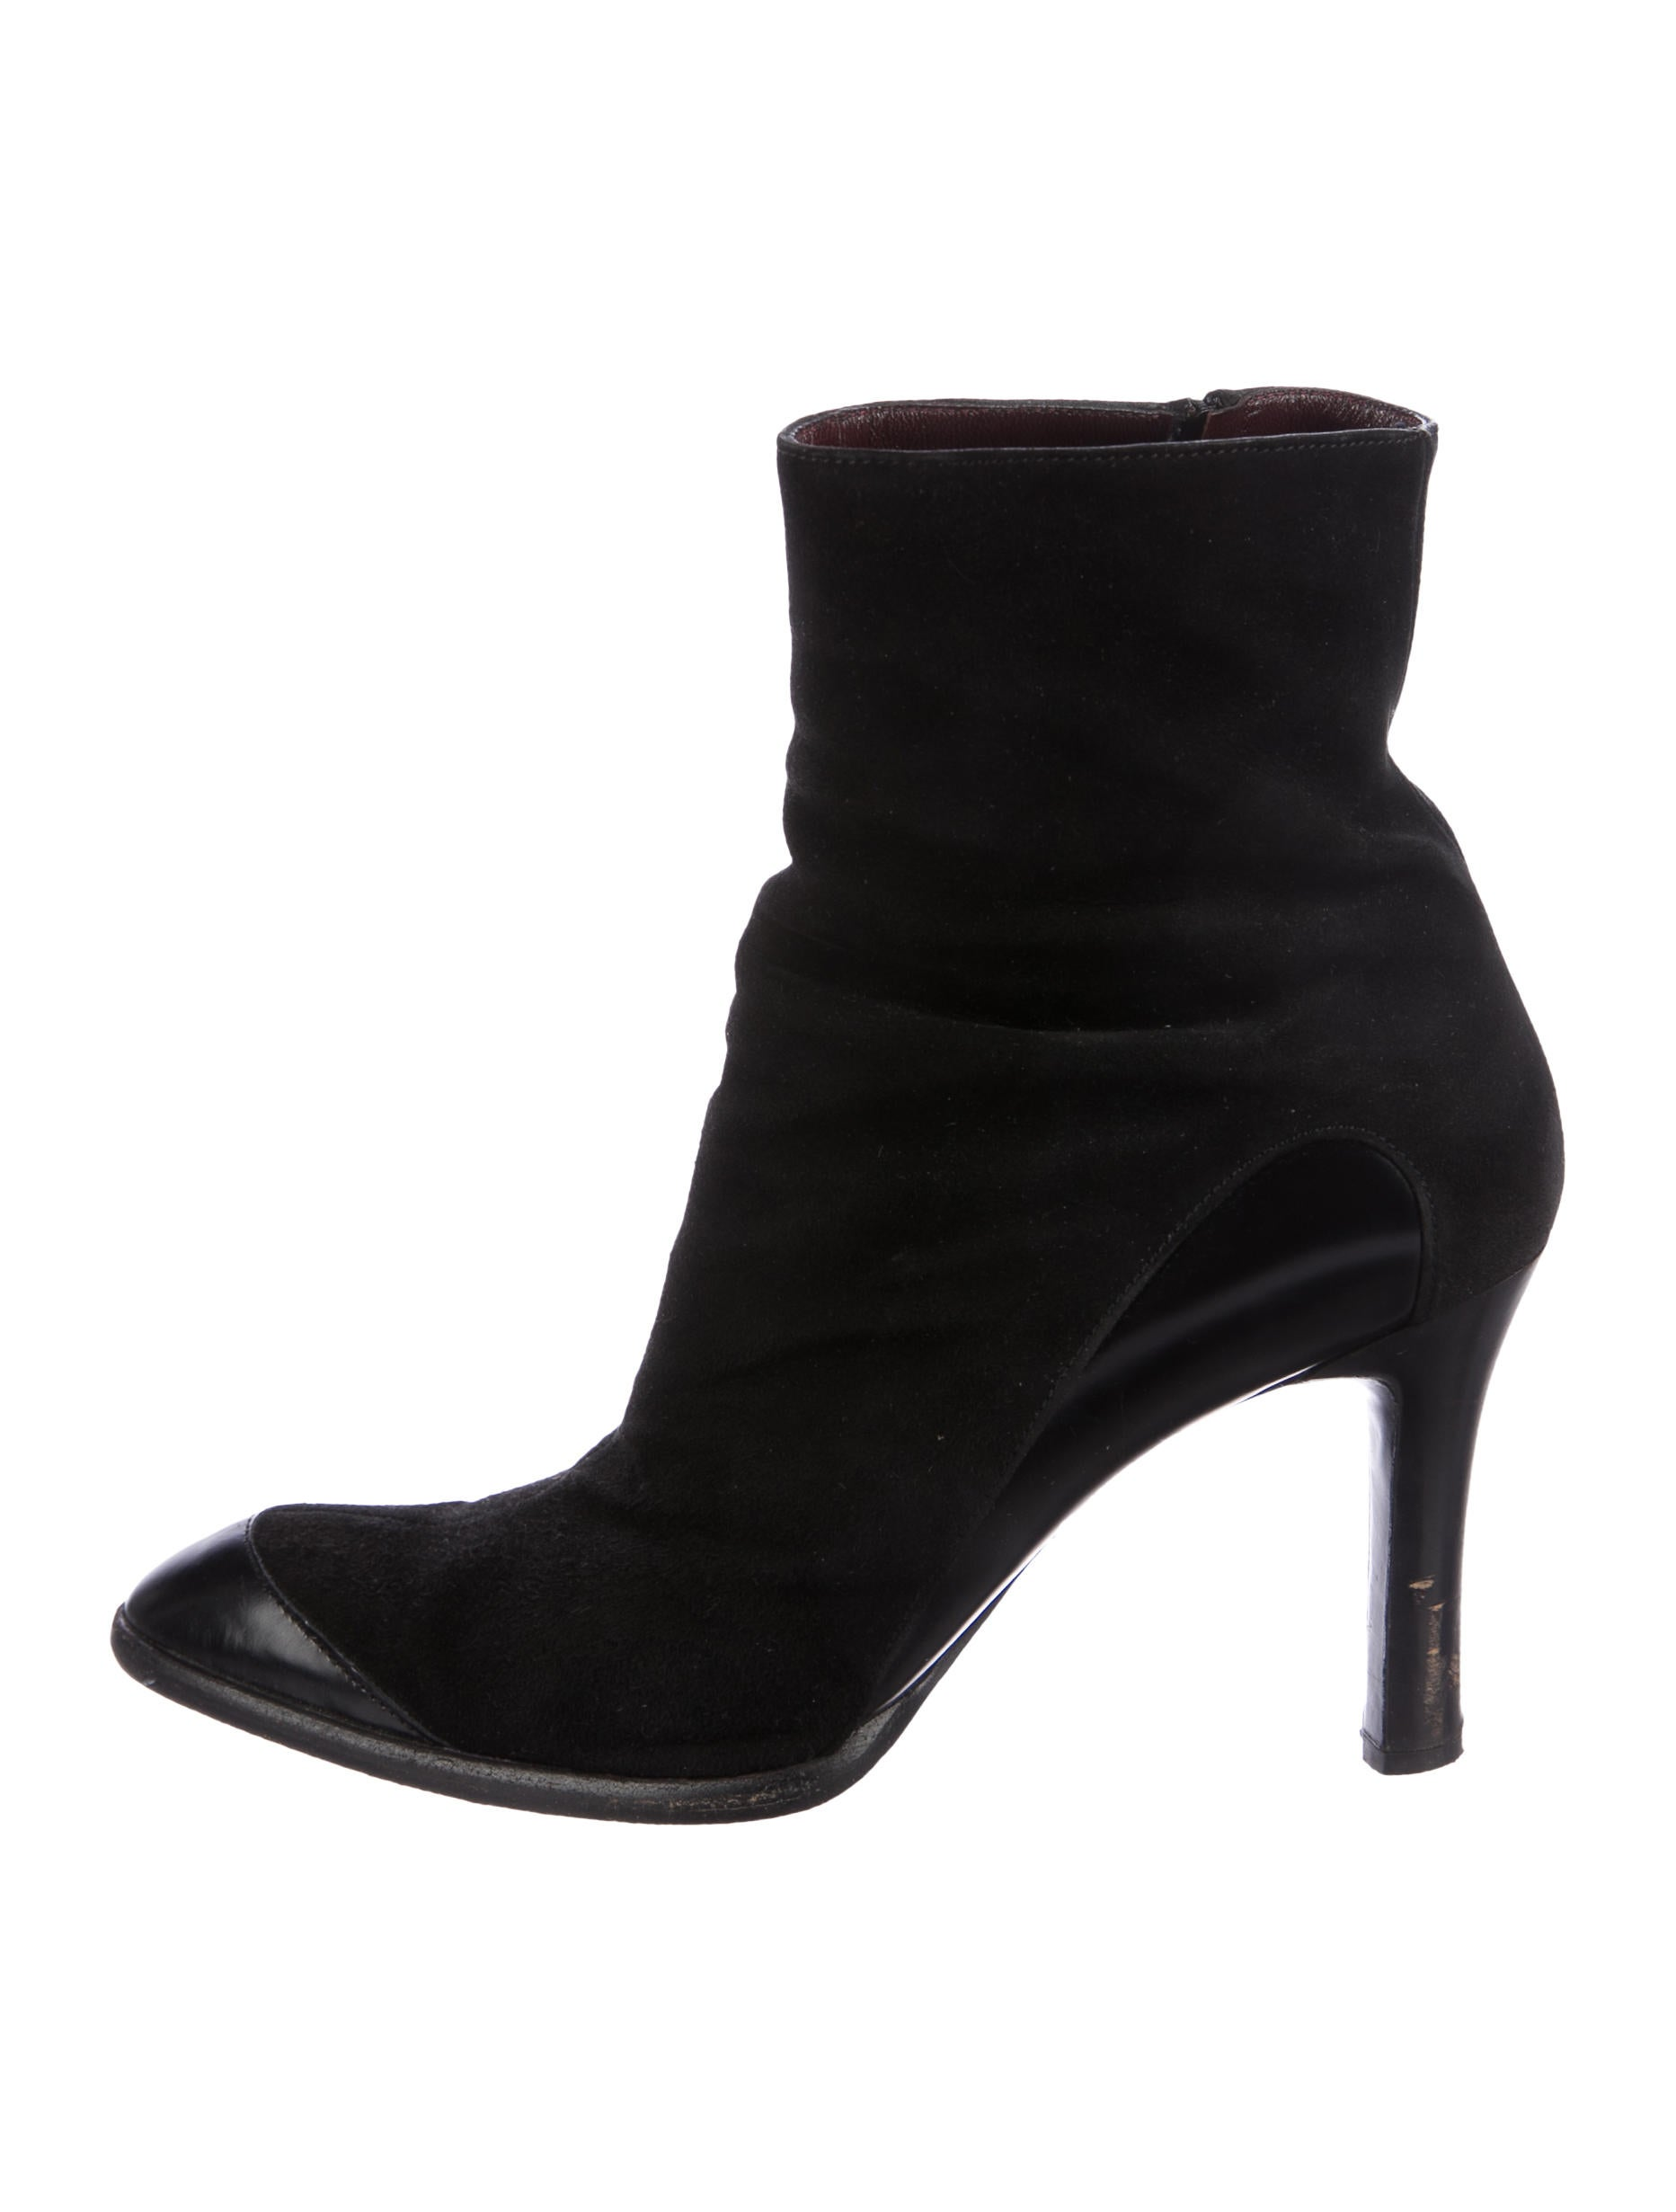 Tod's Suede Cap-Toe Ankle Boots cheap sale pick a best 100% original txhY5IRKs